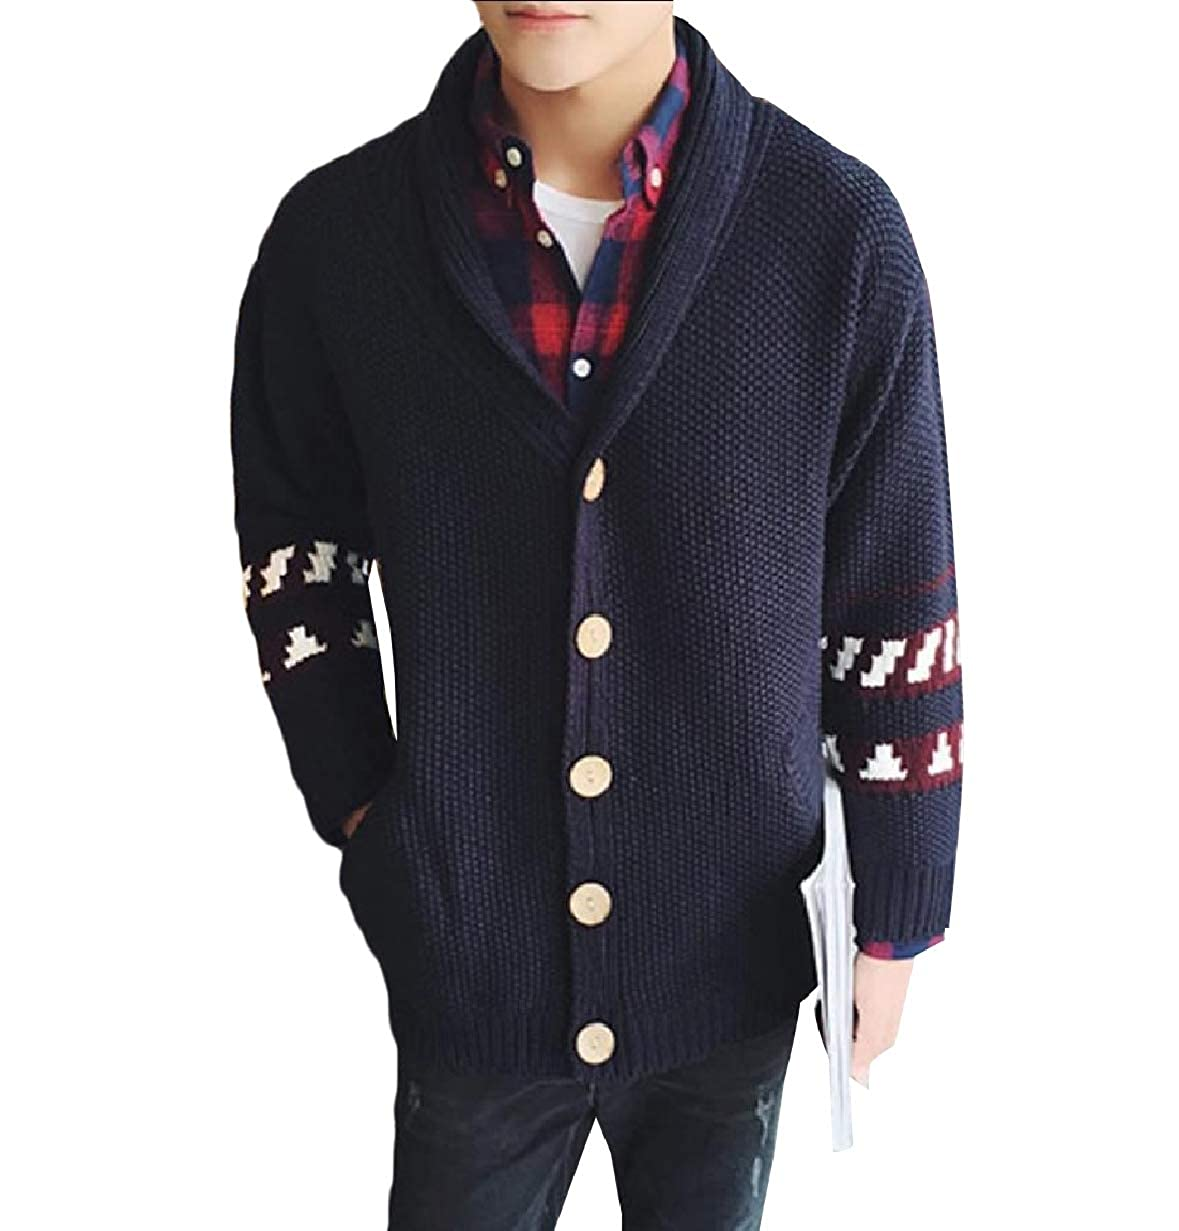 Tootless-Men Leisure Shawl Collar Knit Vintage Cardigan Top Sweater Jumper